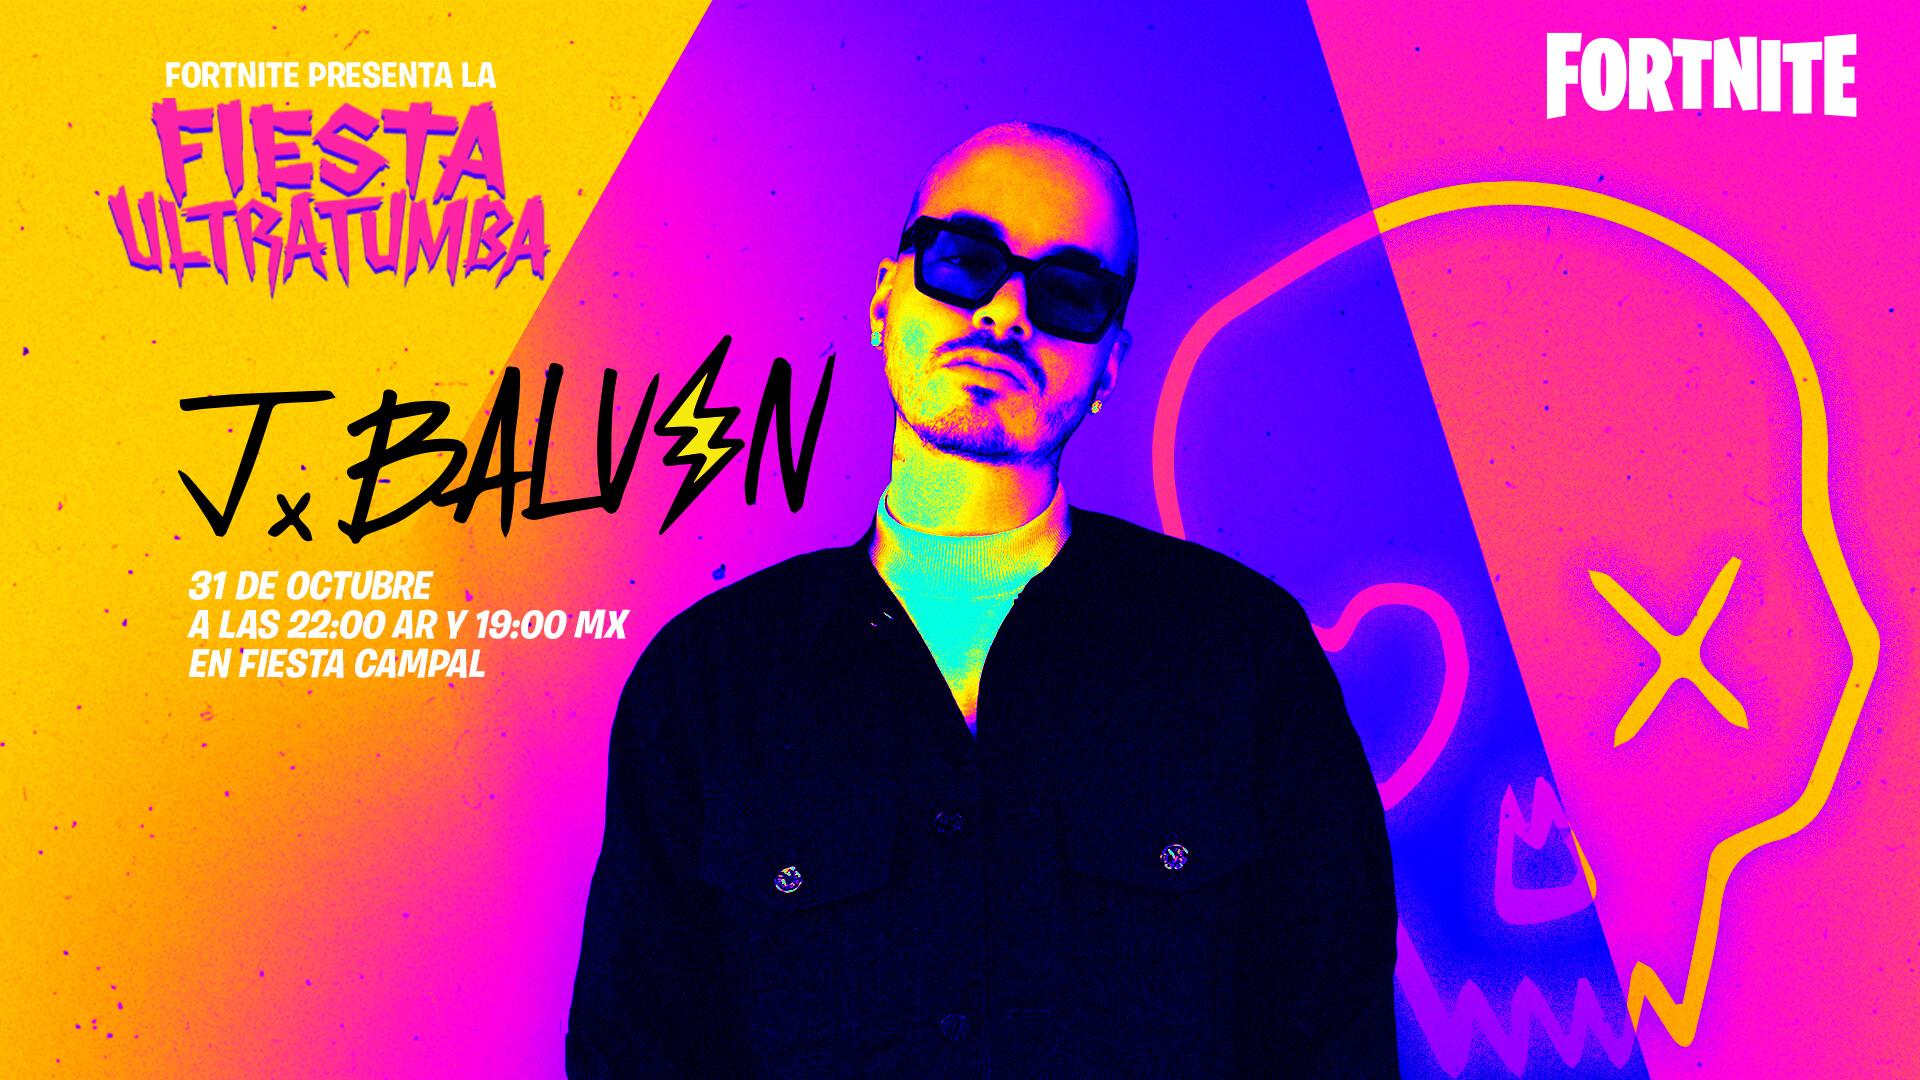 ES MX 14PR JBalvin Announcement Social